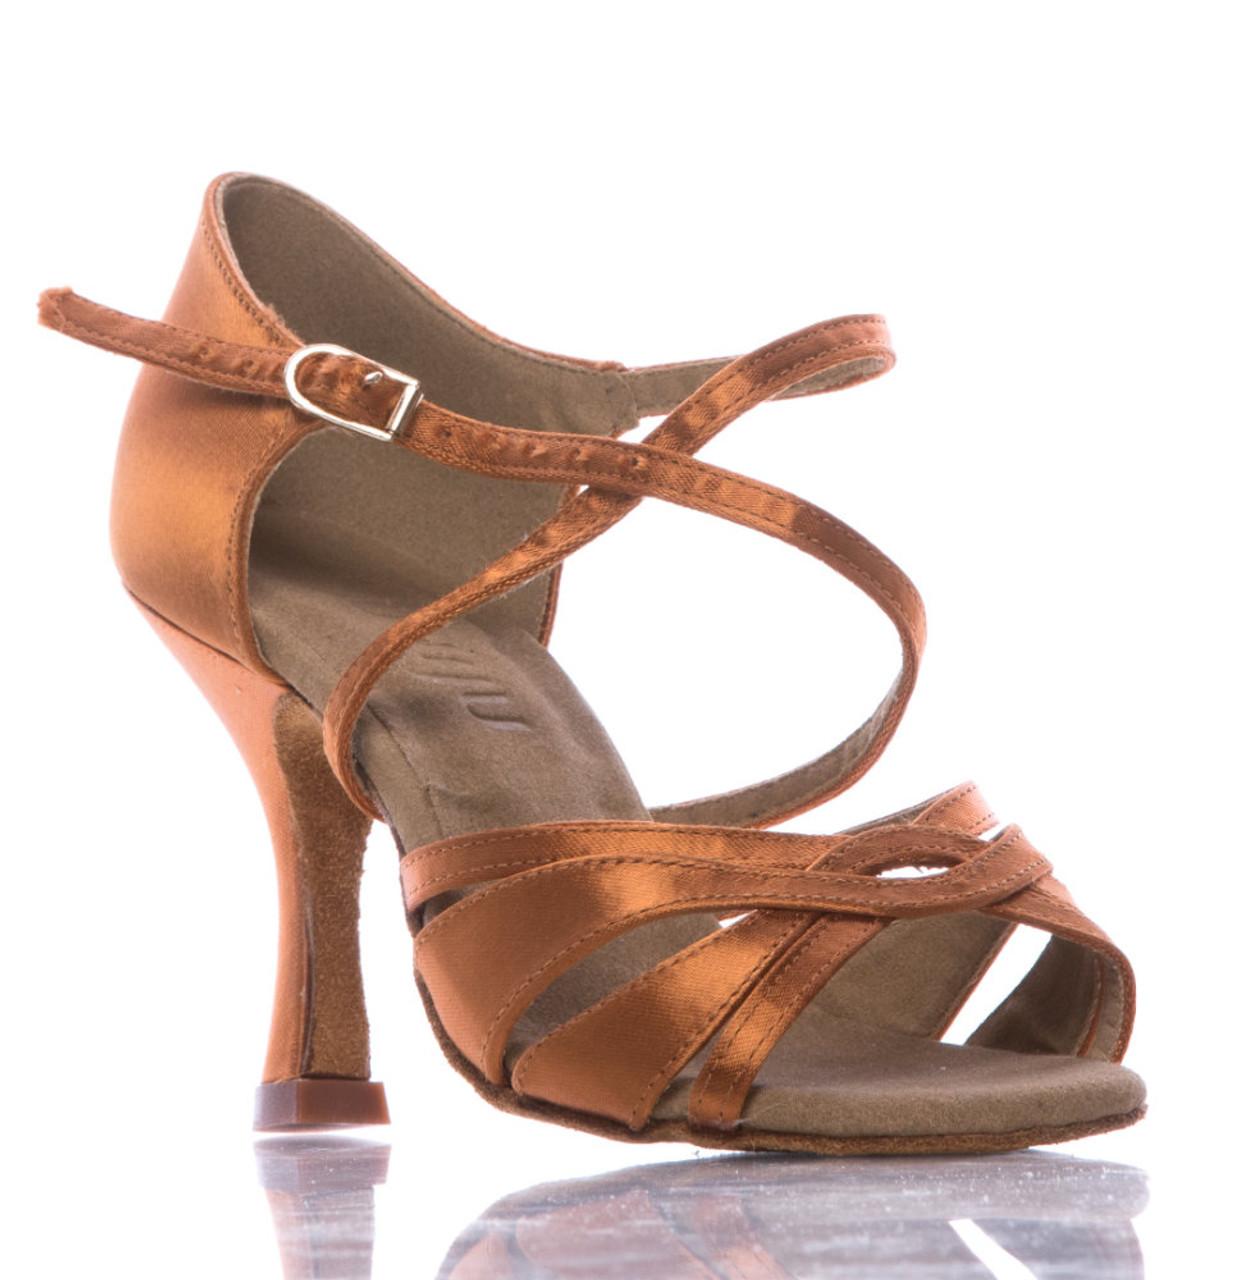 c861aad1349 Loraina - Nude Strappy Dance Shoe - 3.5 inch Flared Heels